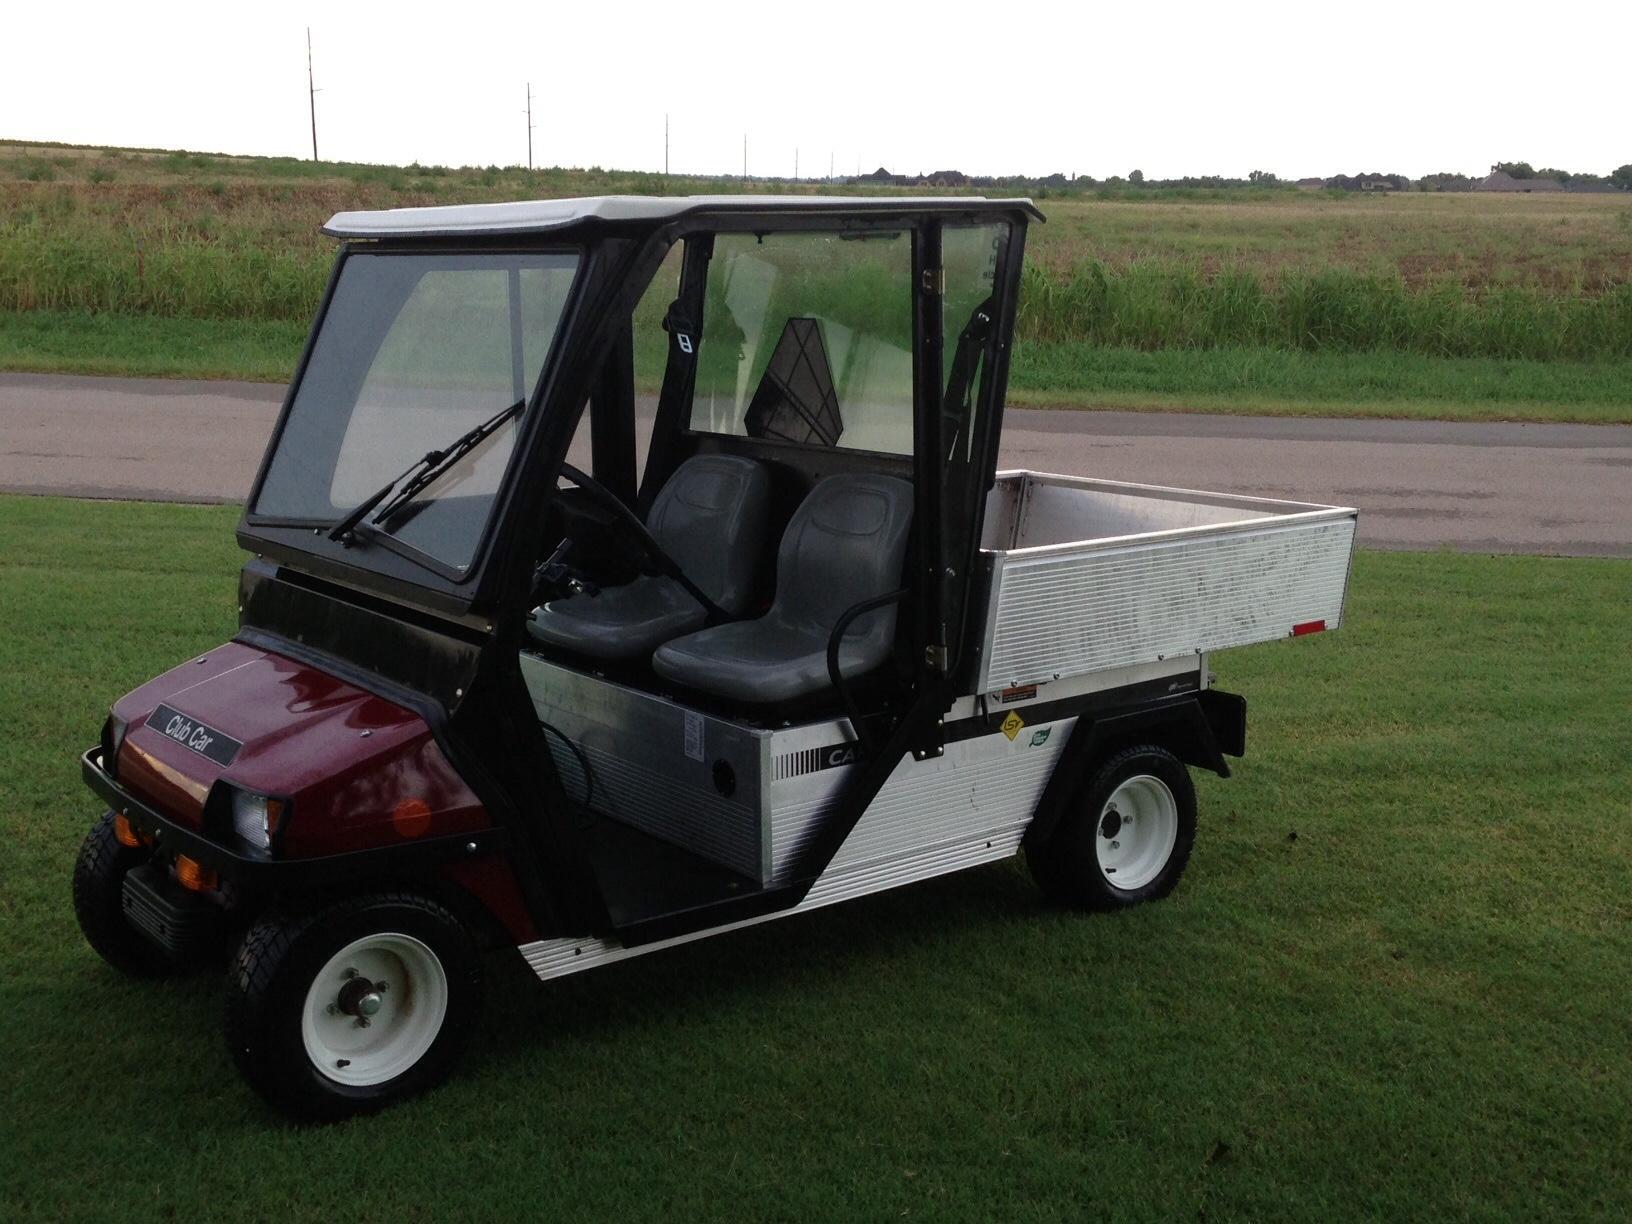 2010 Club Car Carryall 2 Lsv Oklahoma Shooters